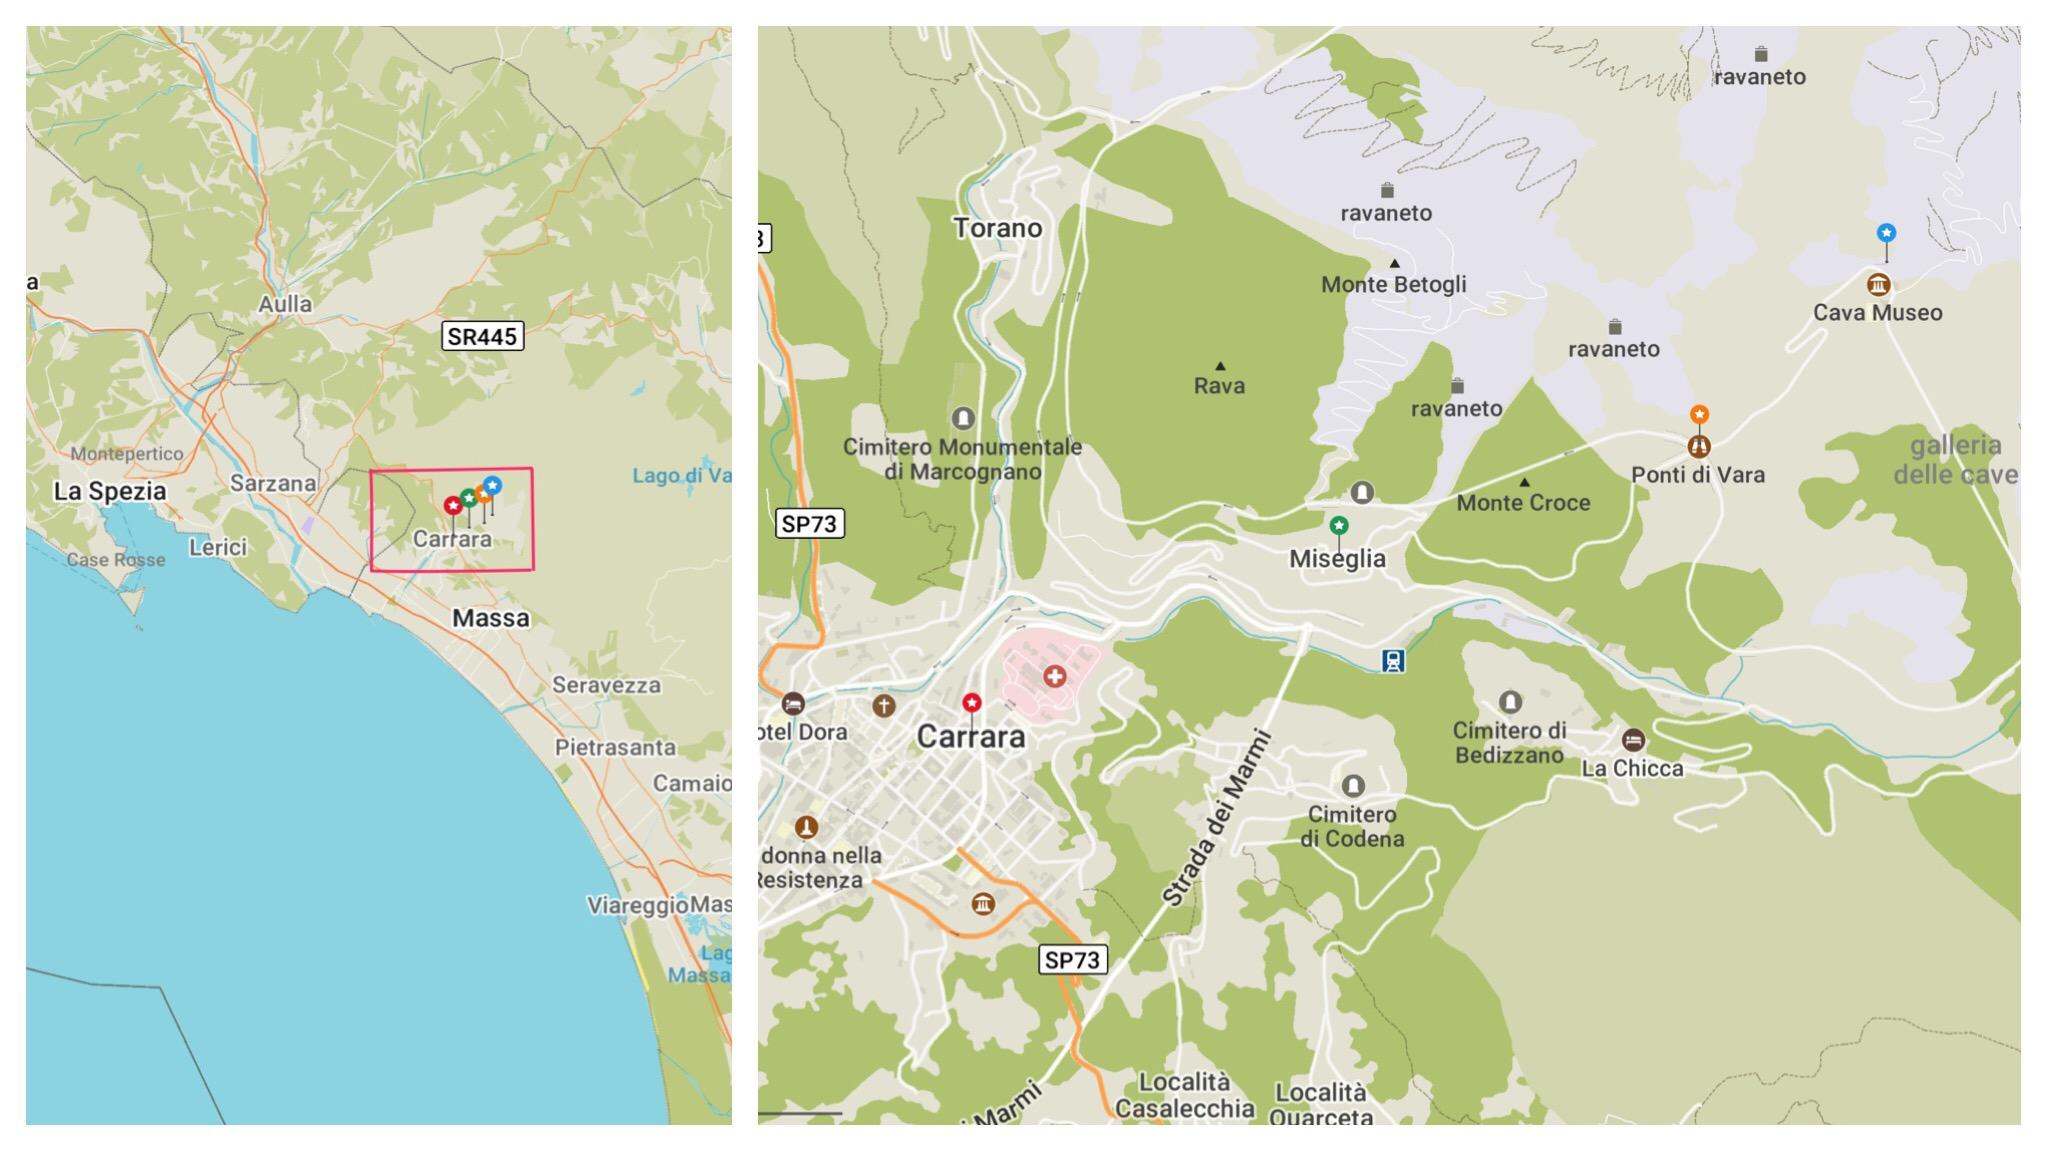 Carrara Marble Quarries Fantiscritti location